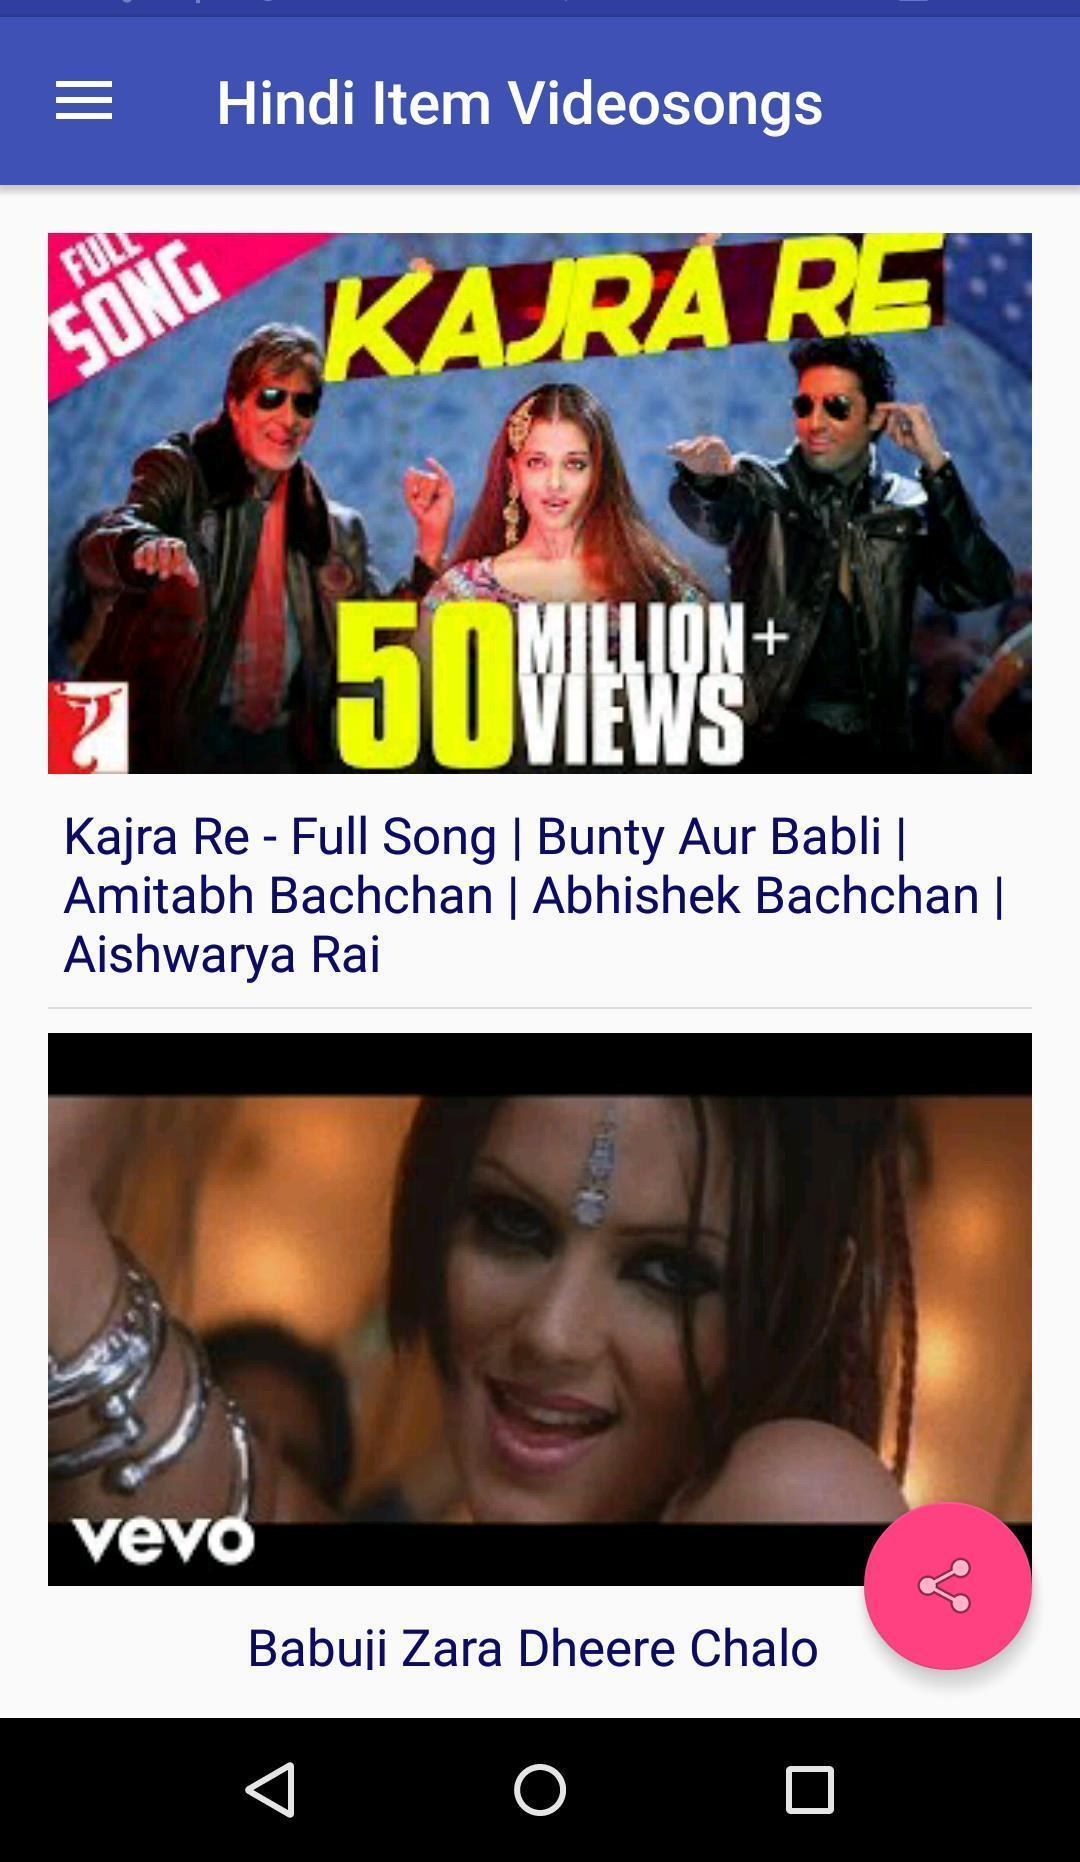 tamil item video songs download tamilrockers